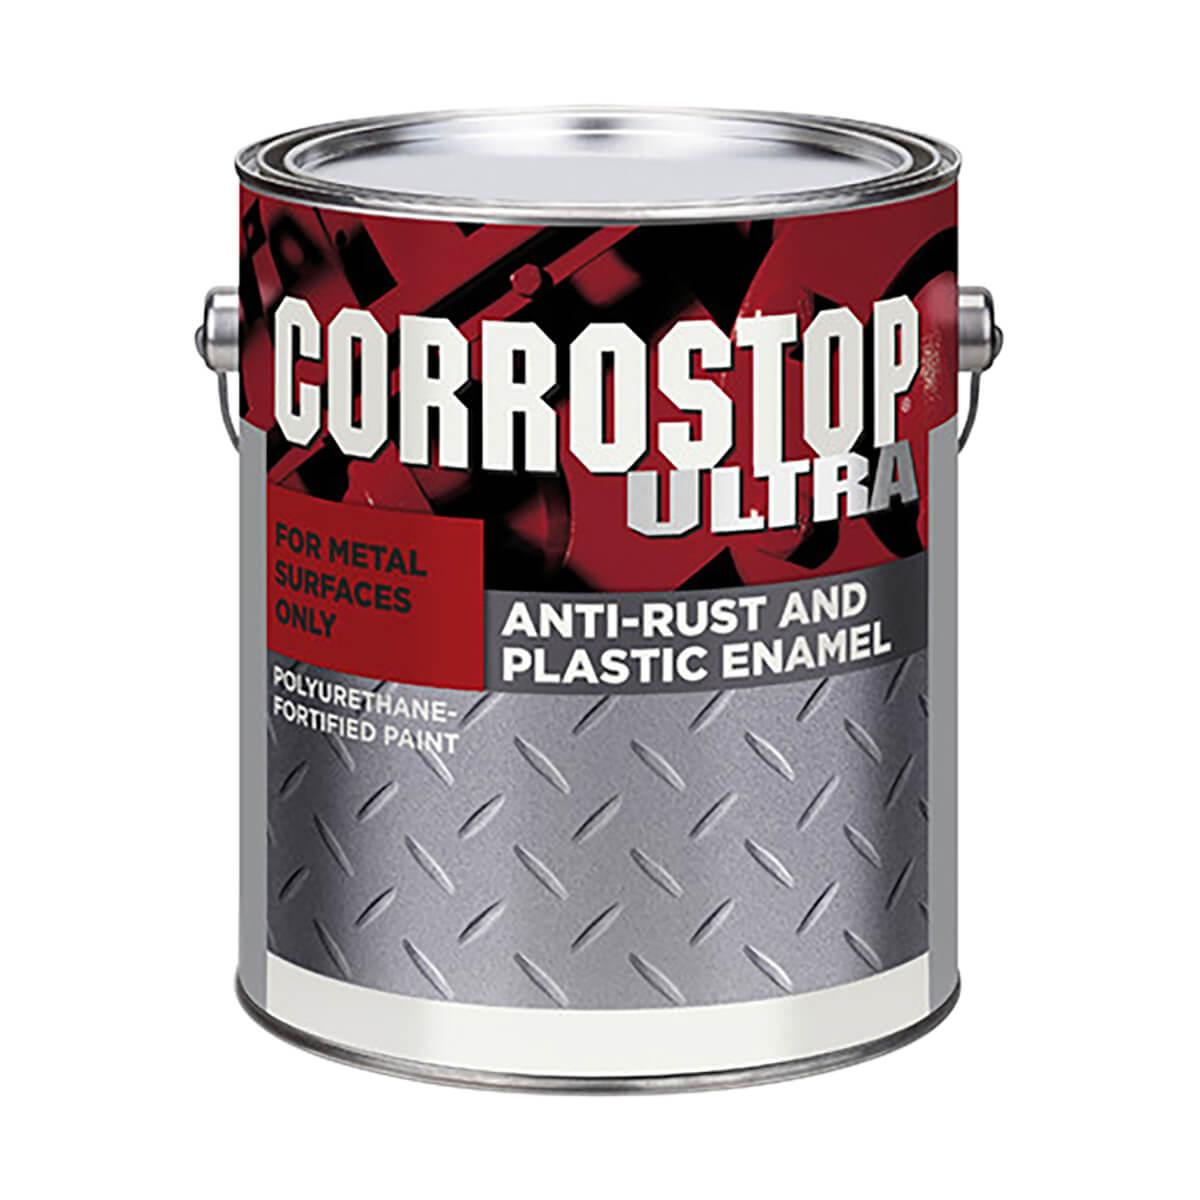 Corrostop - Anti-rust Alkyd Paint - One Grey - 3.78 L